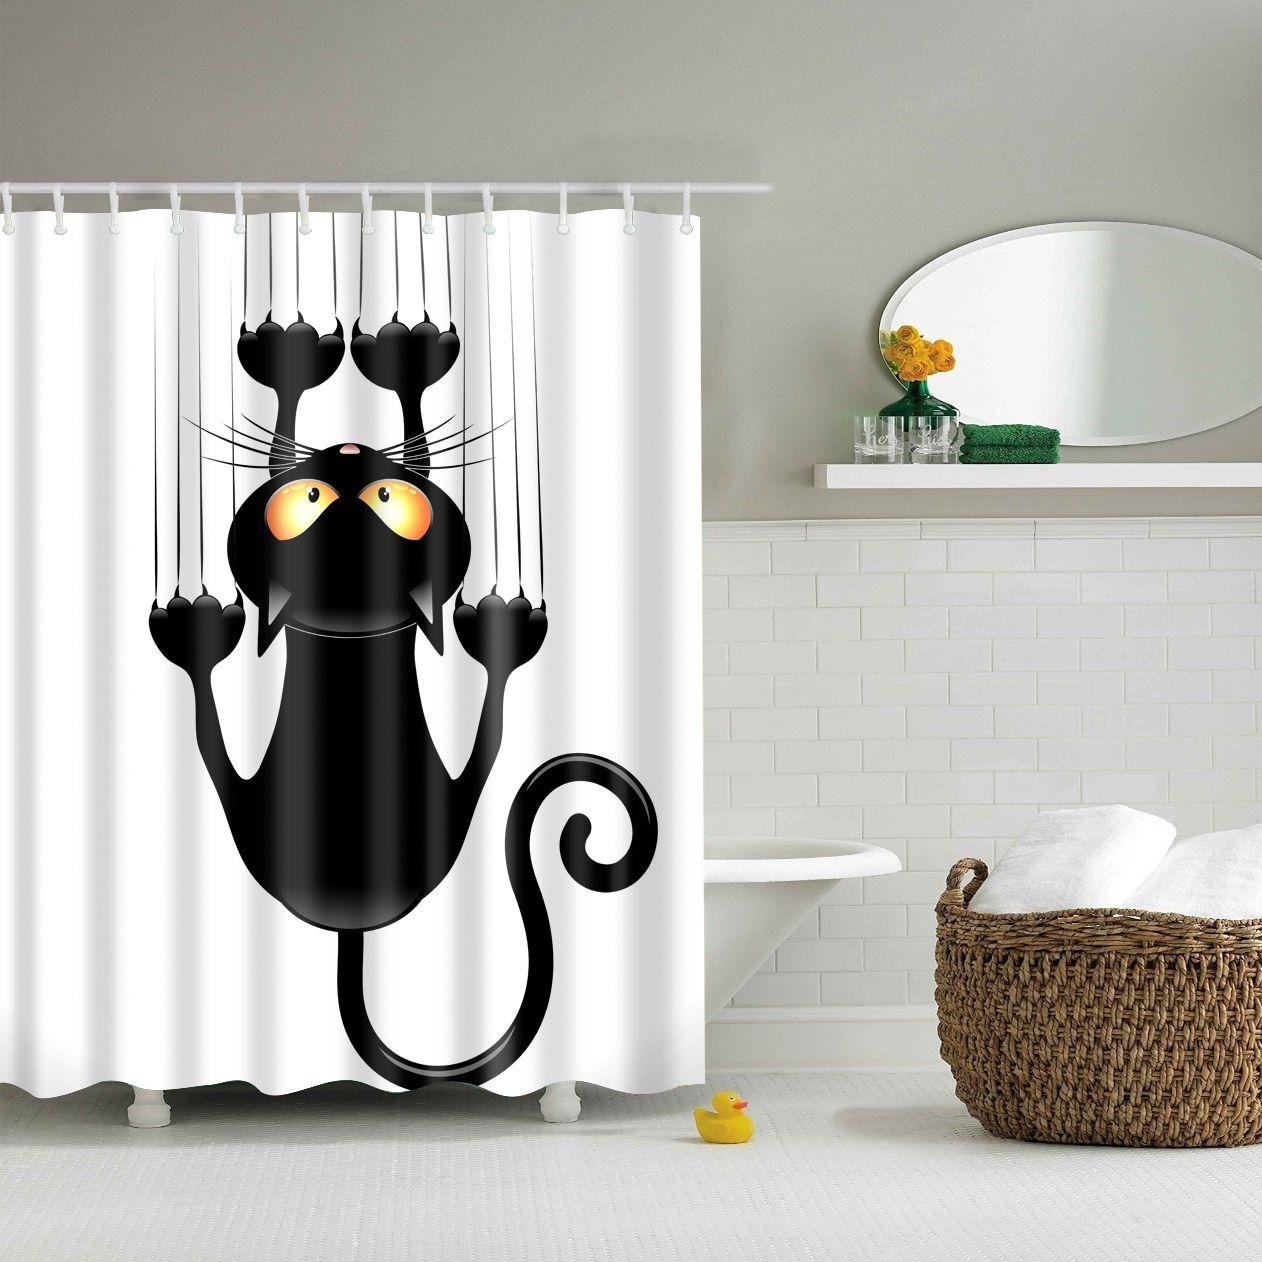 180x180cm De Cartoon Badkamer Fabric Shower Curtain waterdicht ...